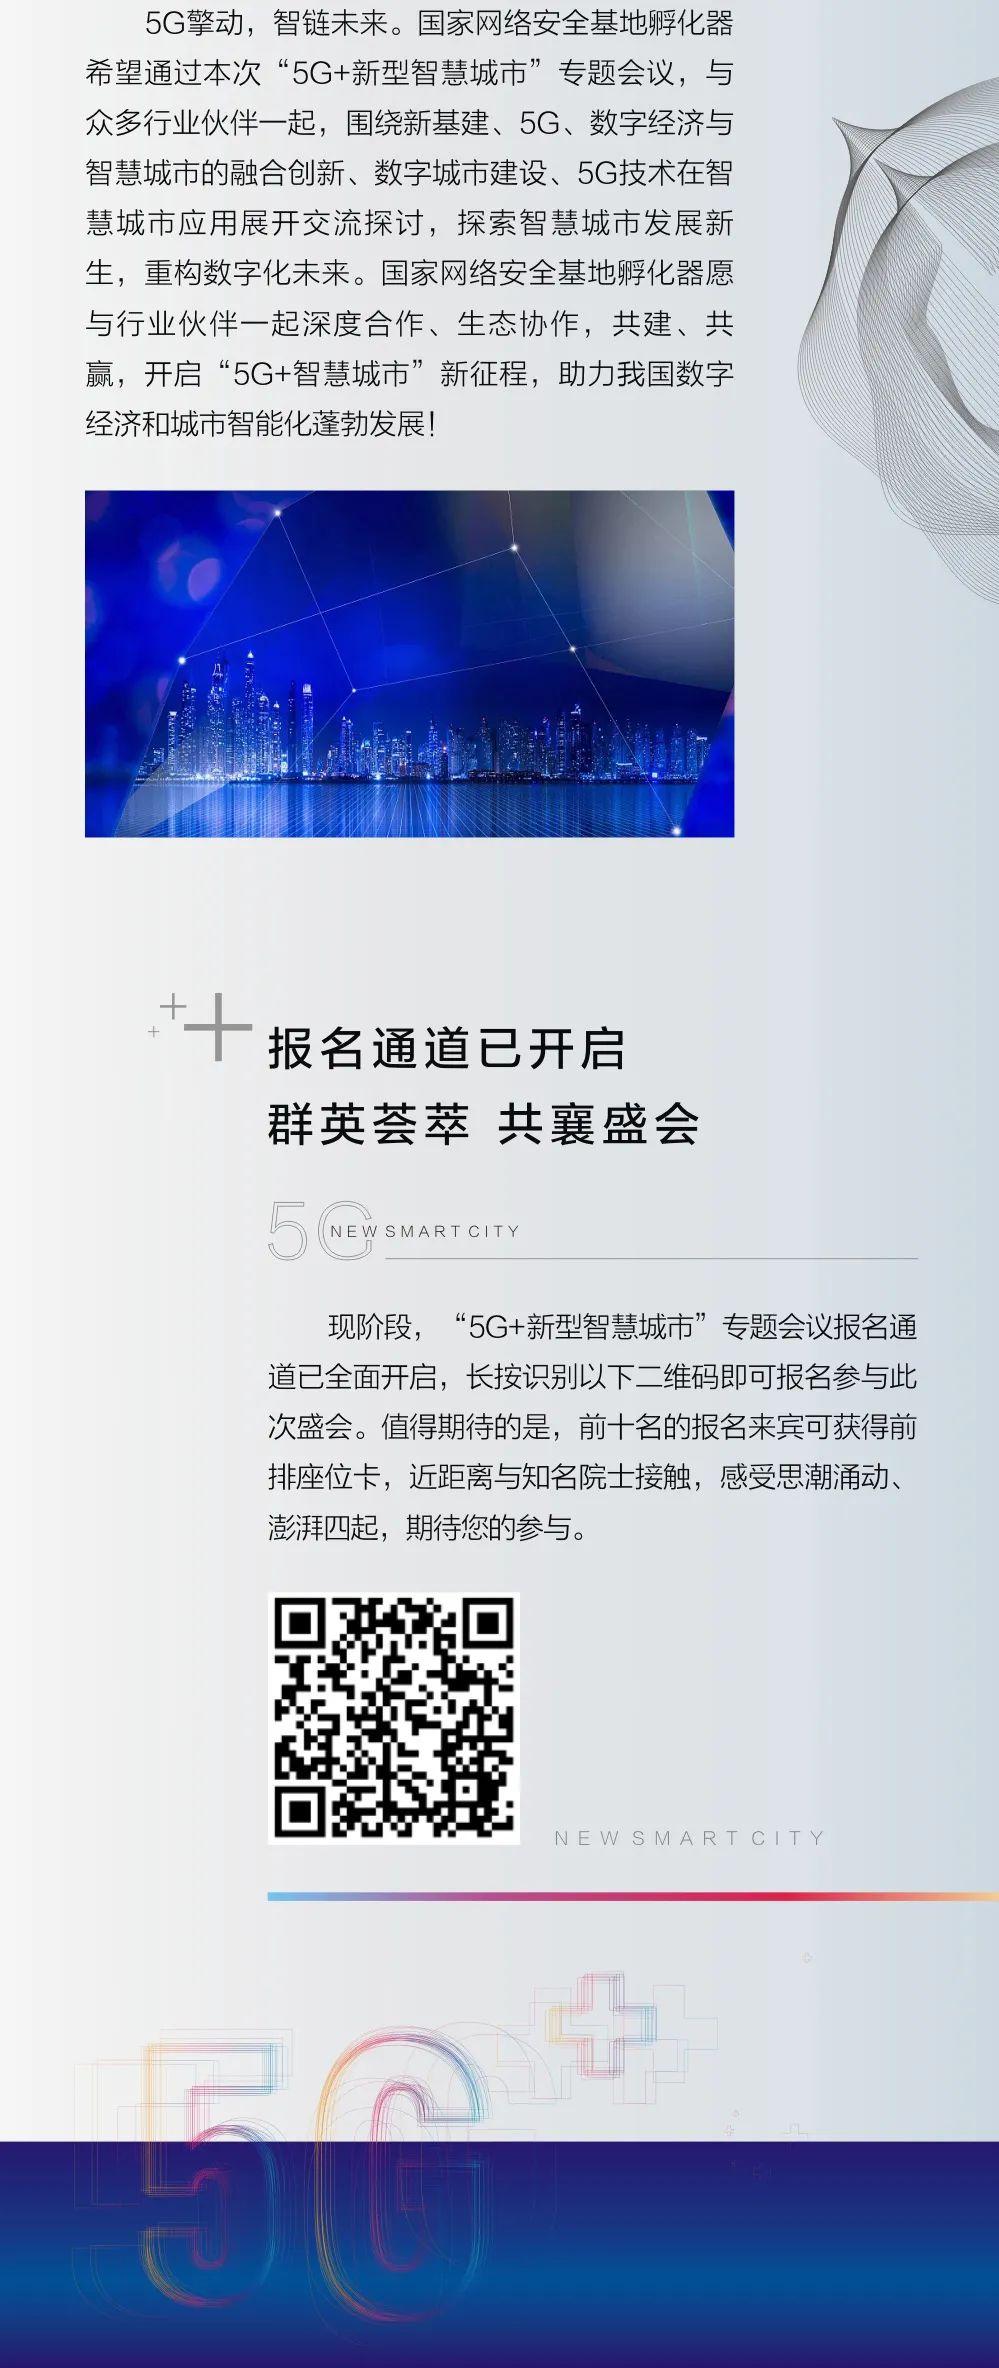 """5G+新型智慧城市""专题会议""点亮""国家级大会"